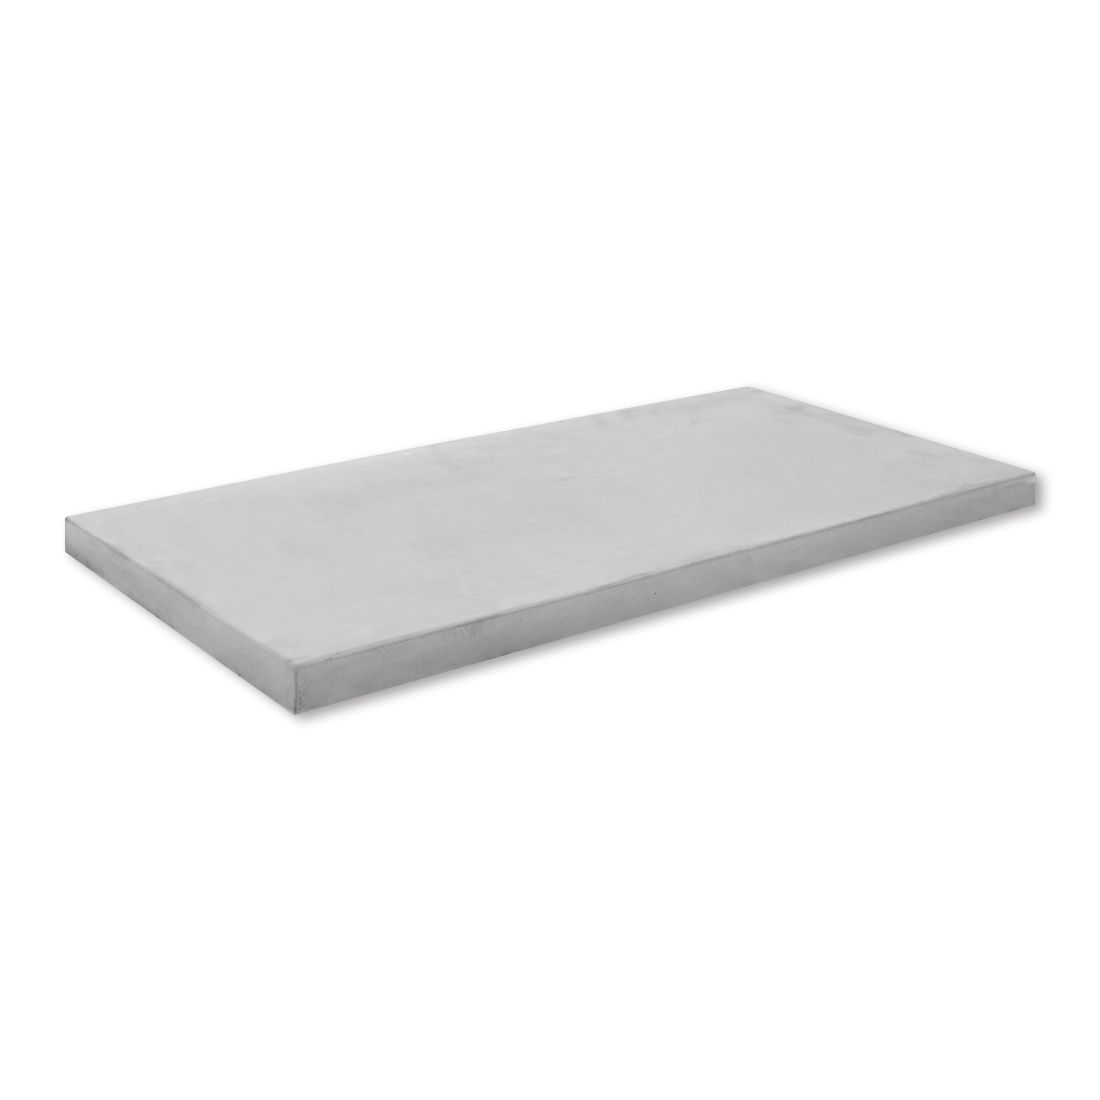 Milano Concrete Paver 800 x 400 x 37mm Natural Stone